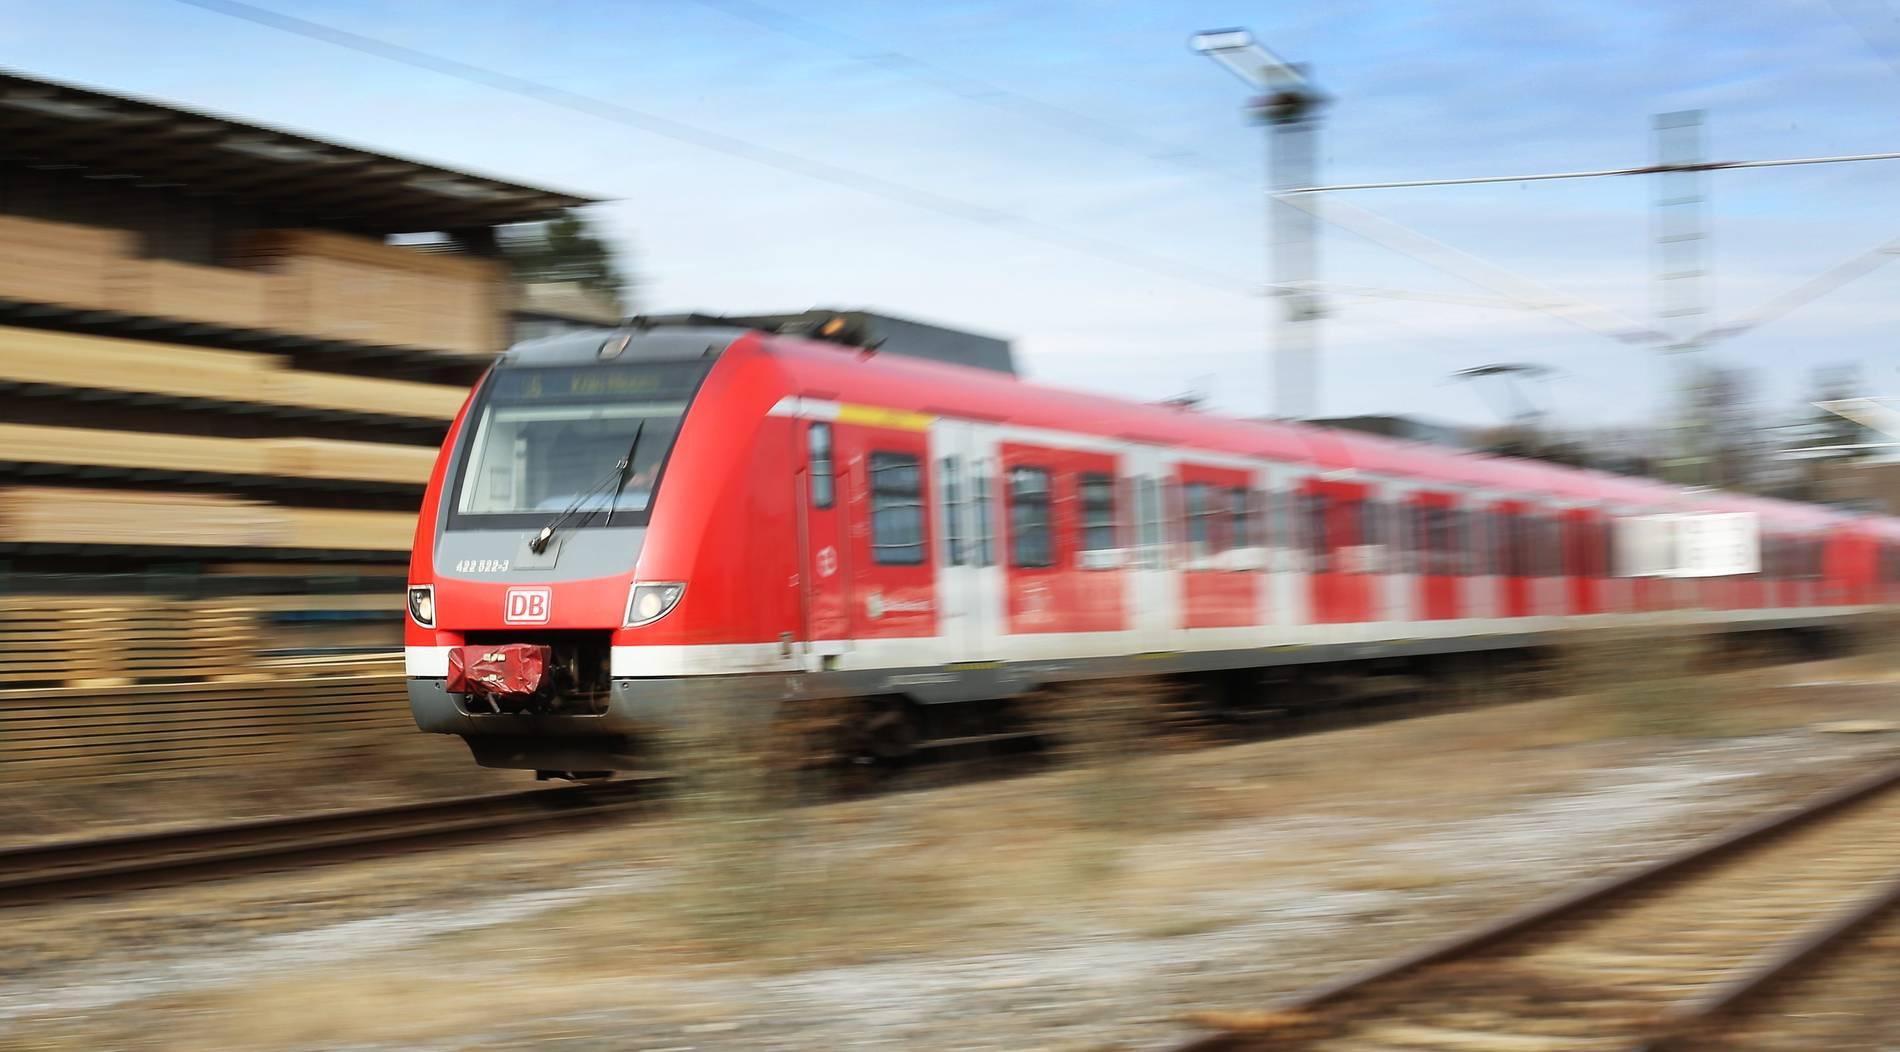 RP-Leser machen Druck: Bahn bietet Zusatz-Busse an